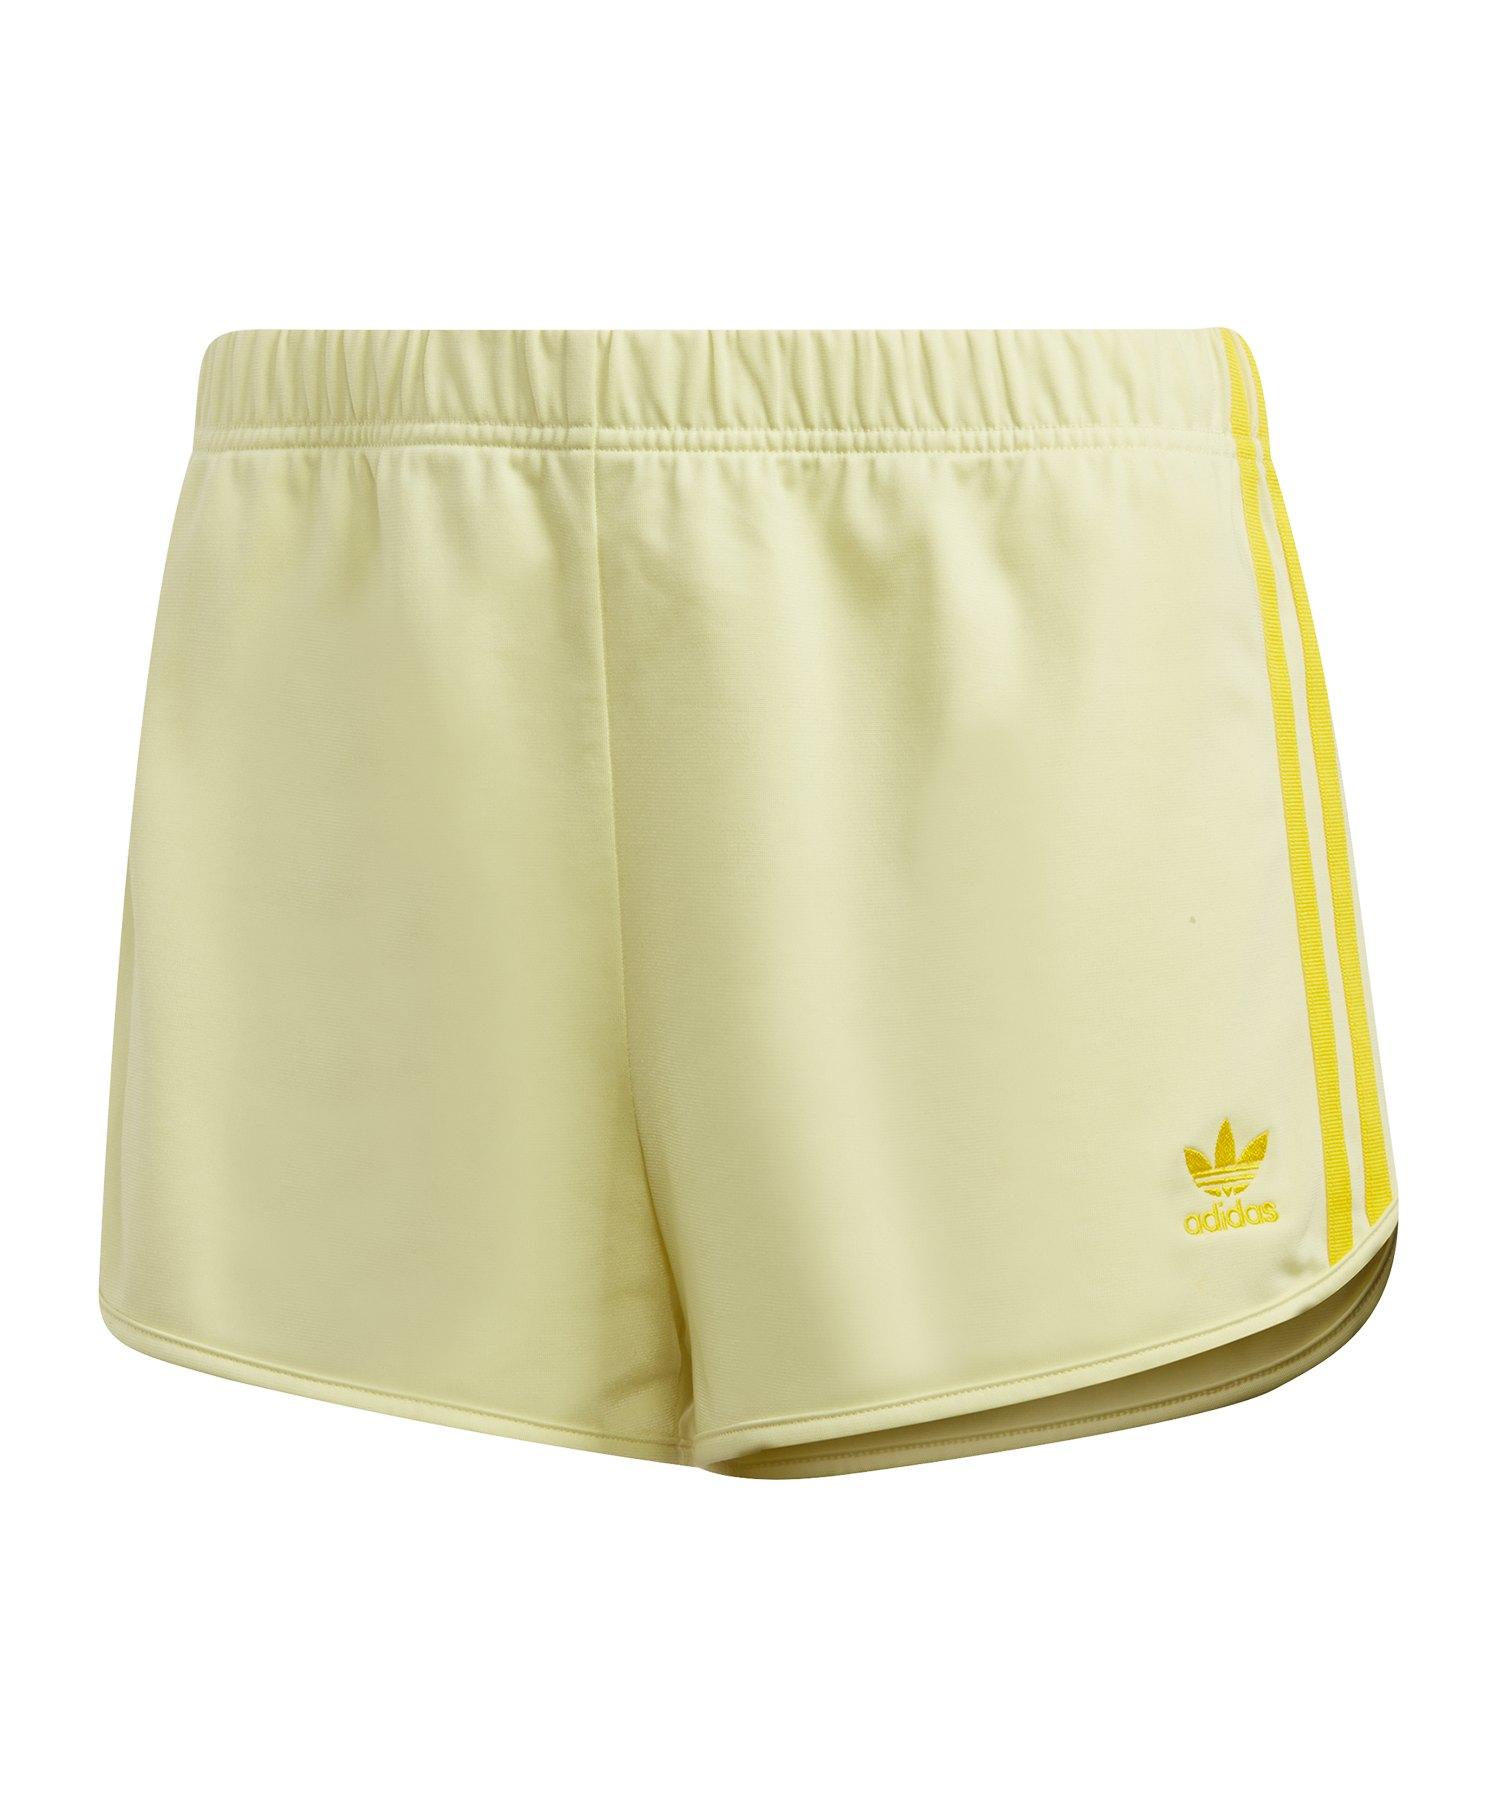 adidas Originals 3 Strips Damen Short Gelb